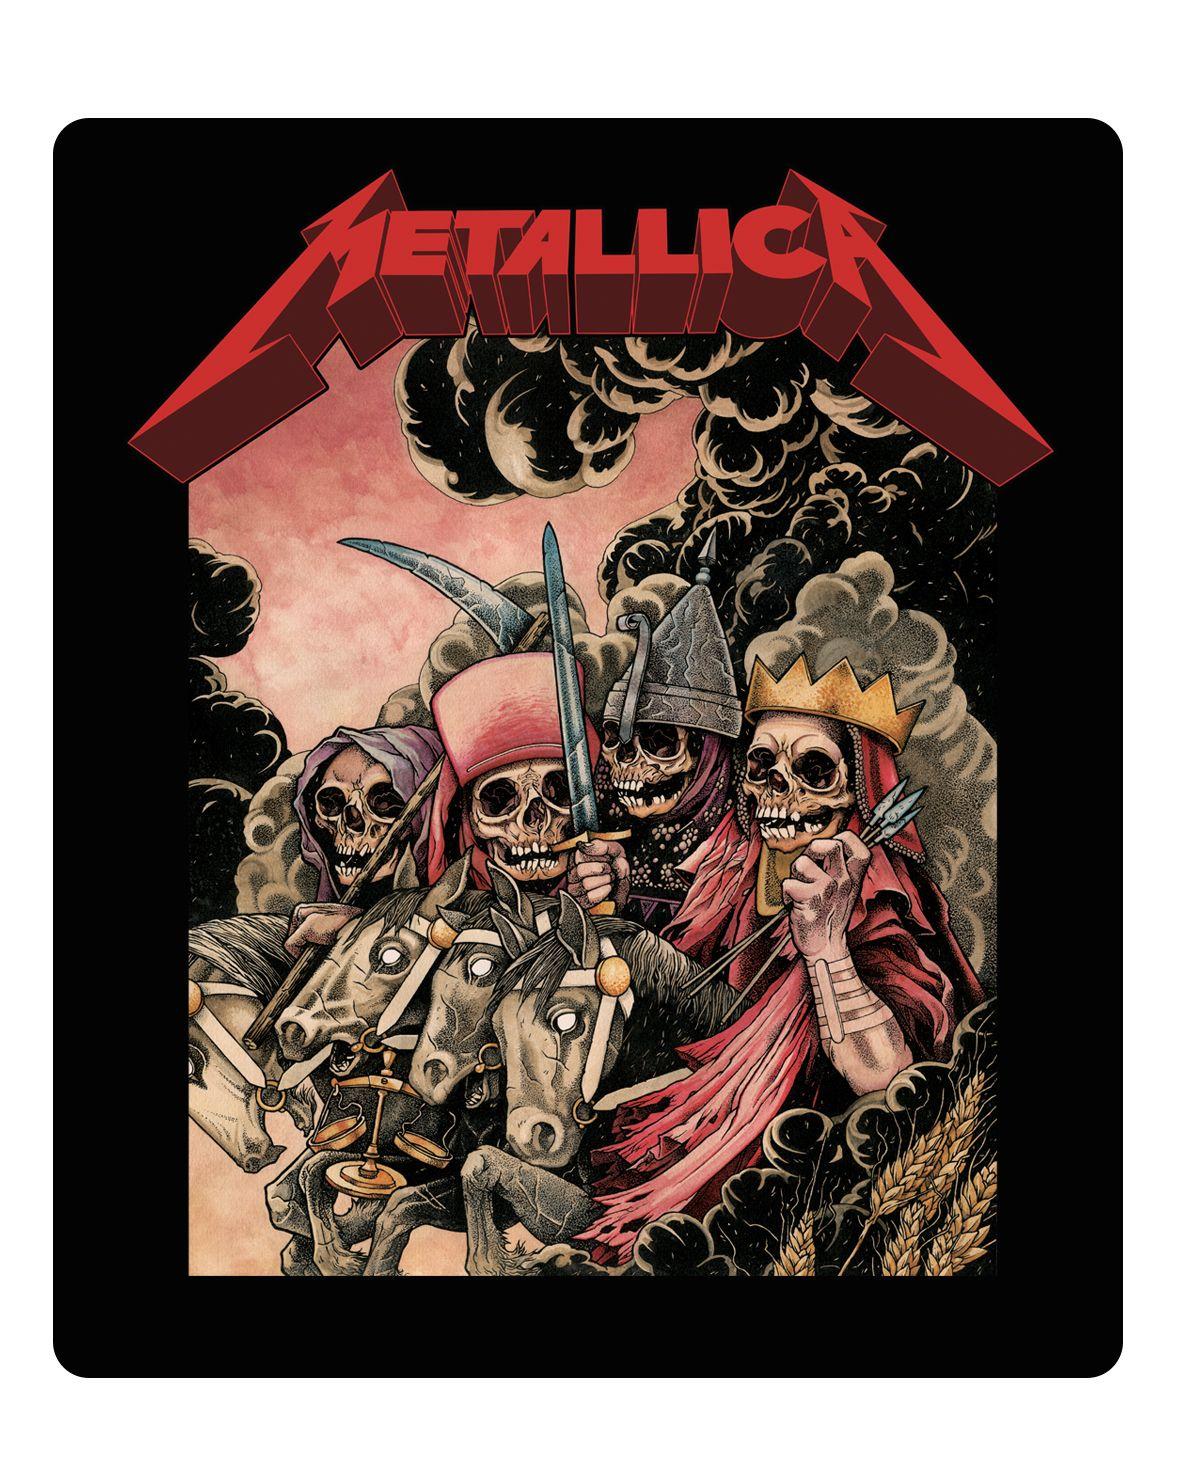 Metallica - The Four Horsemen [Adesivo]